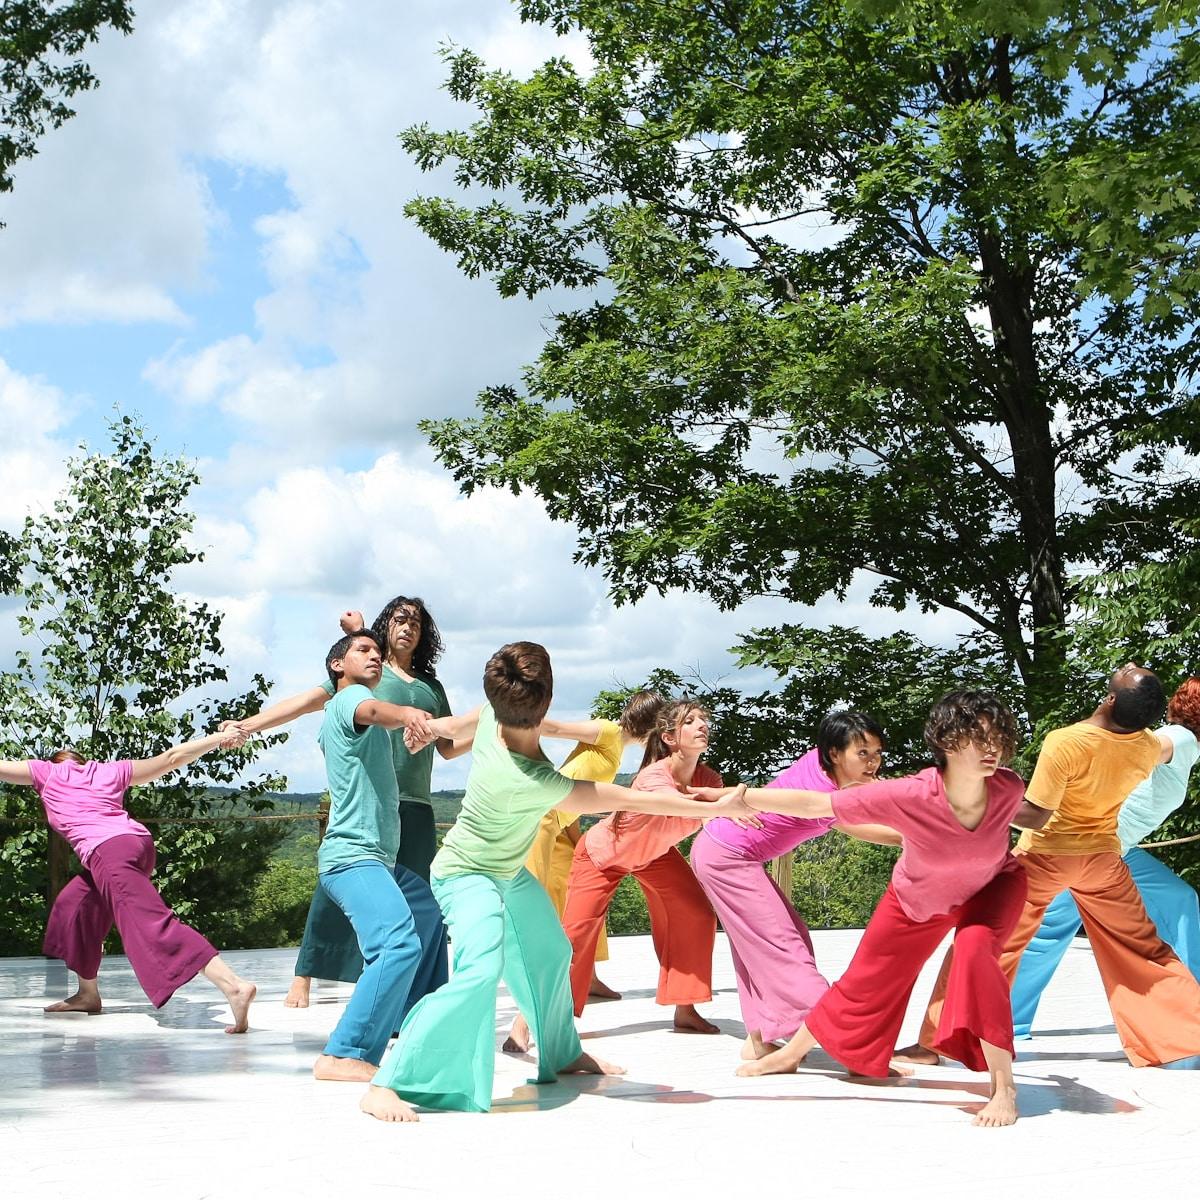 News_Nancy Wozny_Jacob's Pillow_Suchu Dance_at_Inside_Out